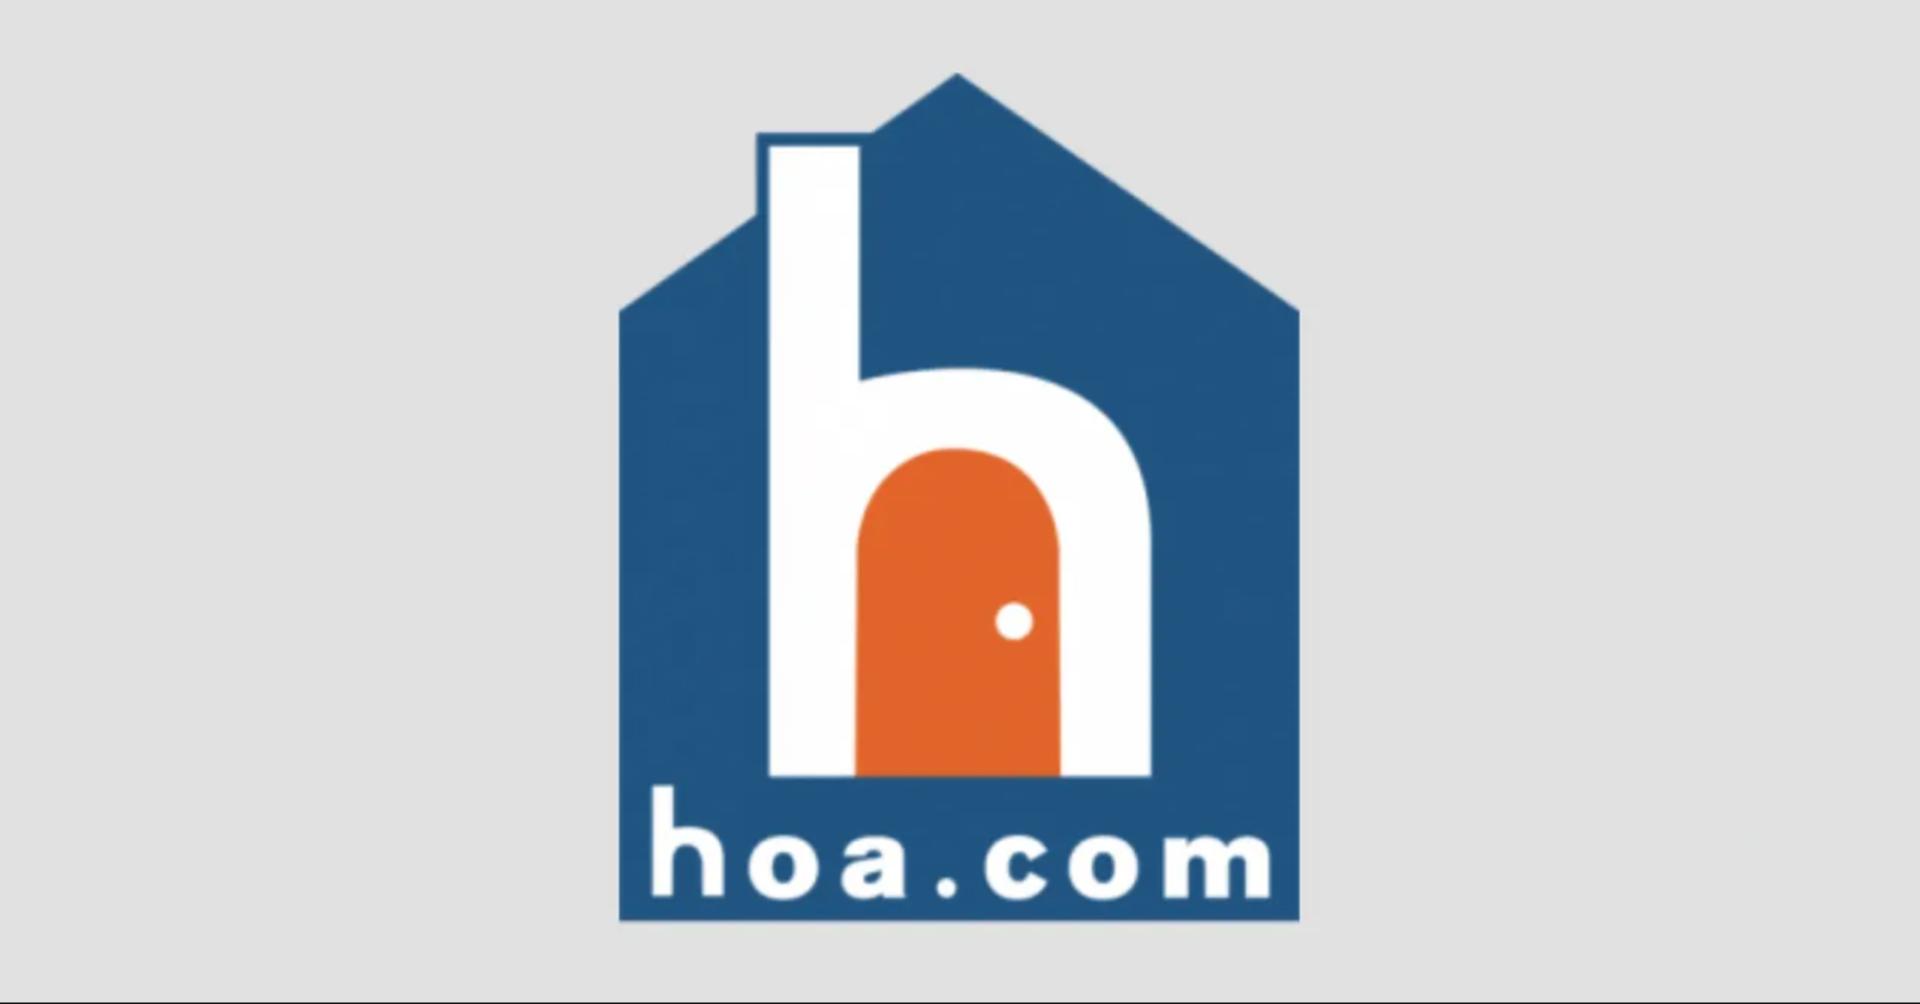 HOA.com and Local Pros Network Announce Strategic Partnership